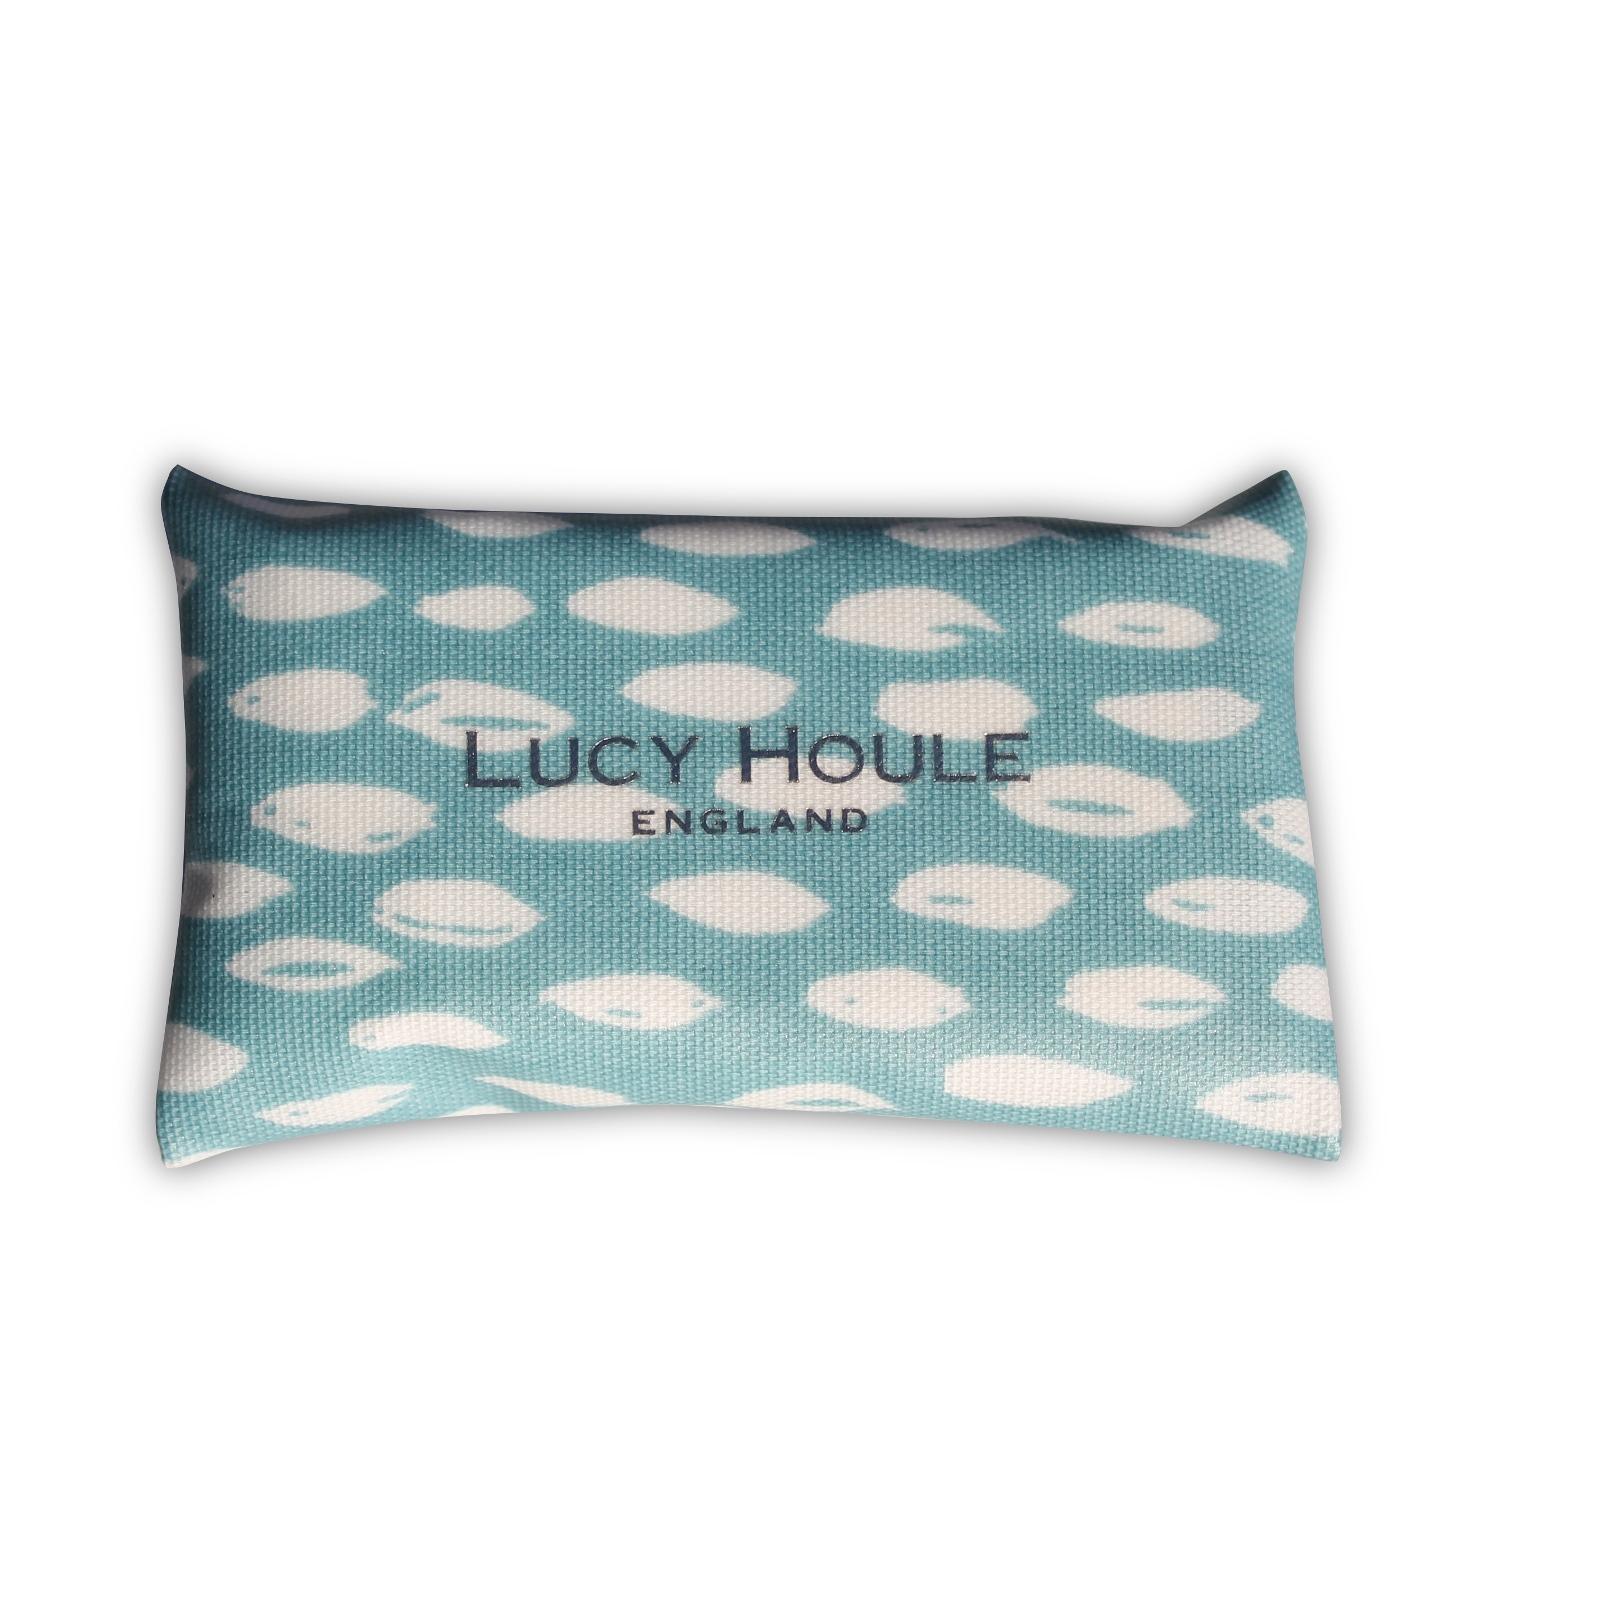 Aqua Feather Pocket Tissue Holder